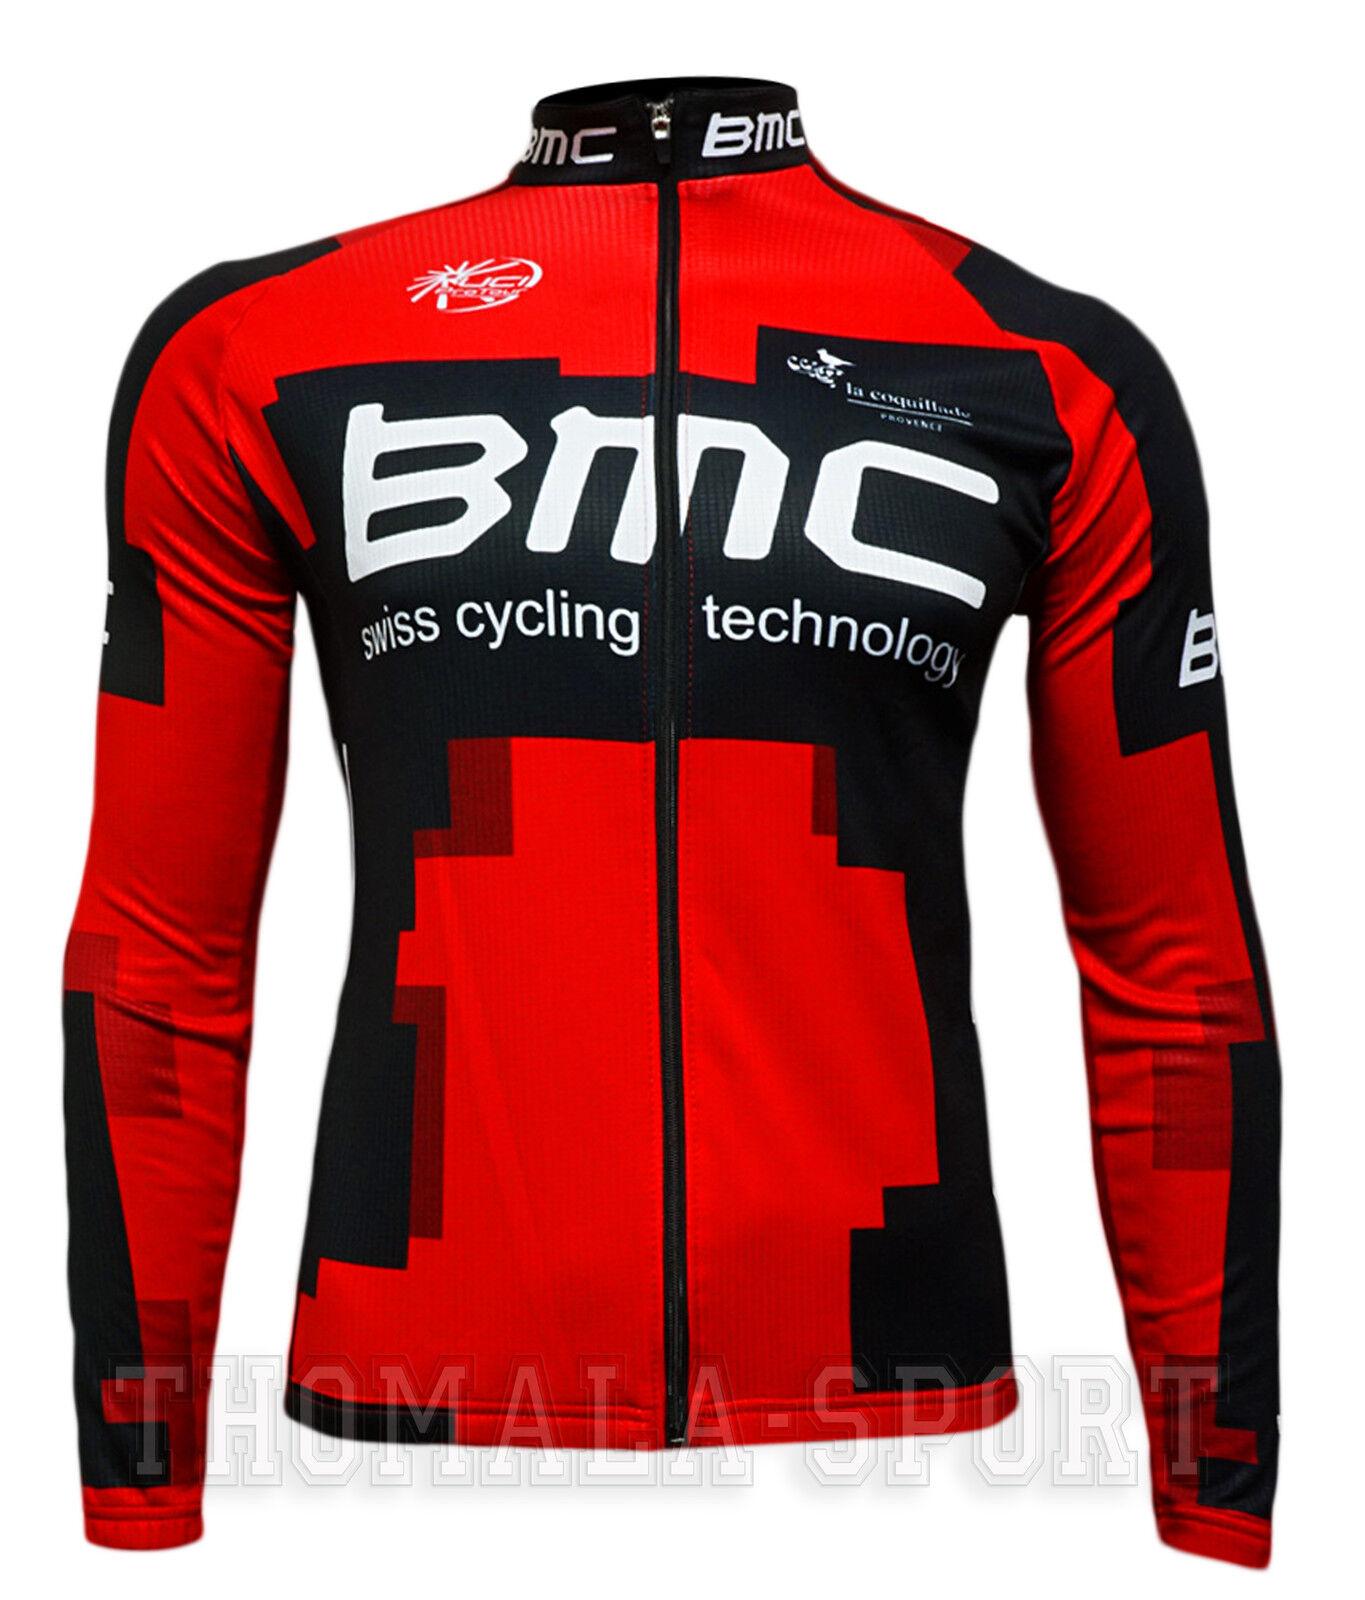 BMC squadra-Maglia uomoica lunga-TG. S, M, L, XL, XXL, XXXL-Nuovo -  --    --    --